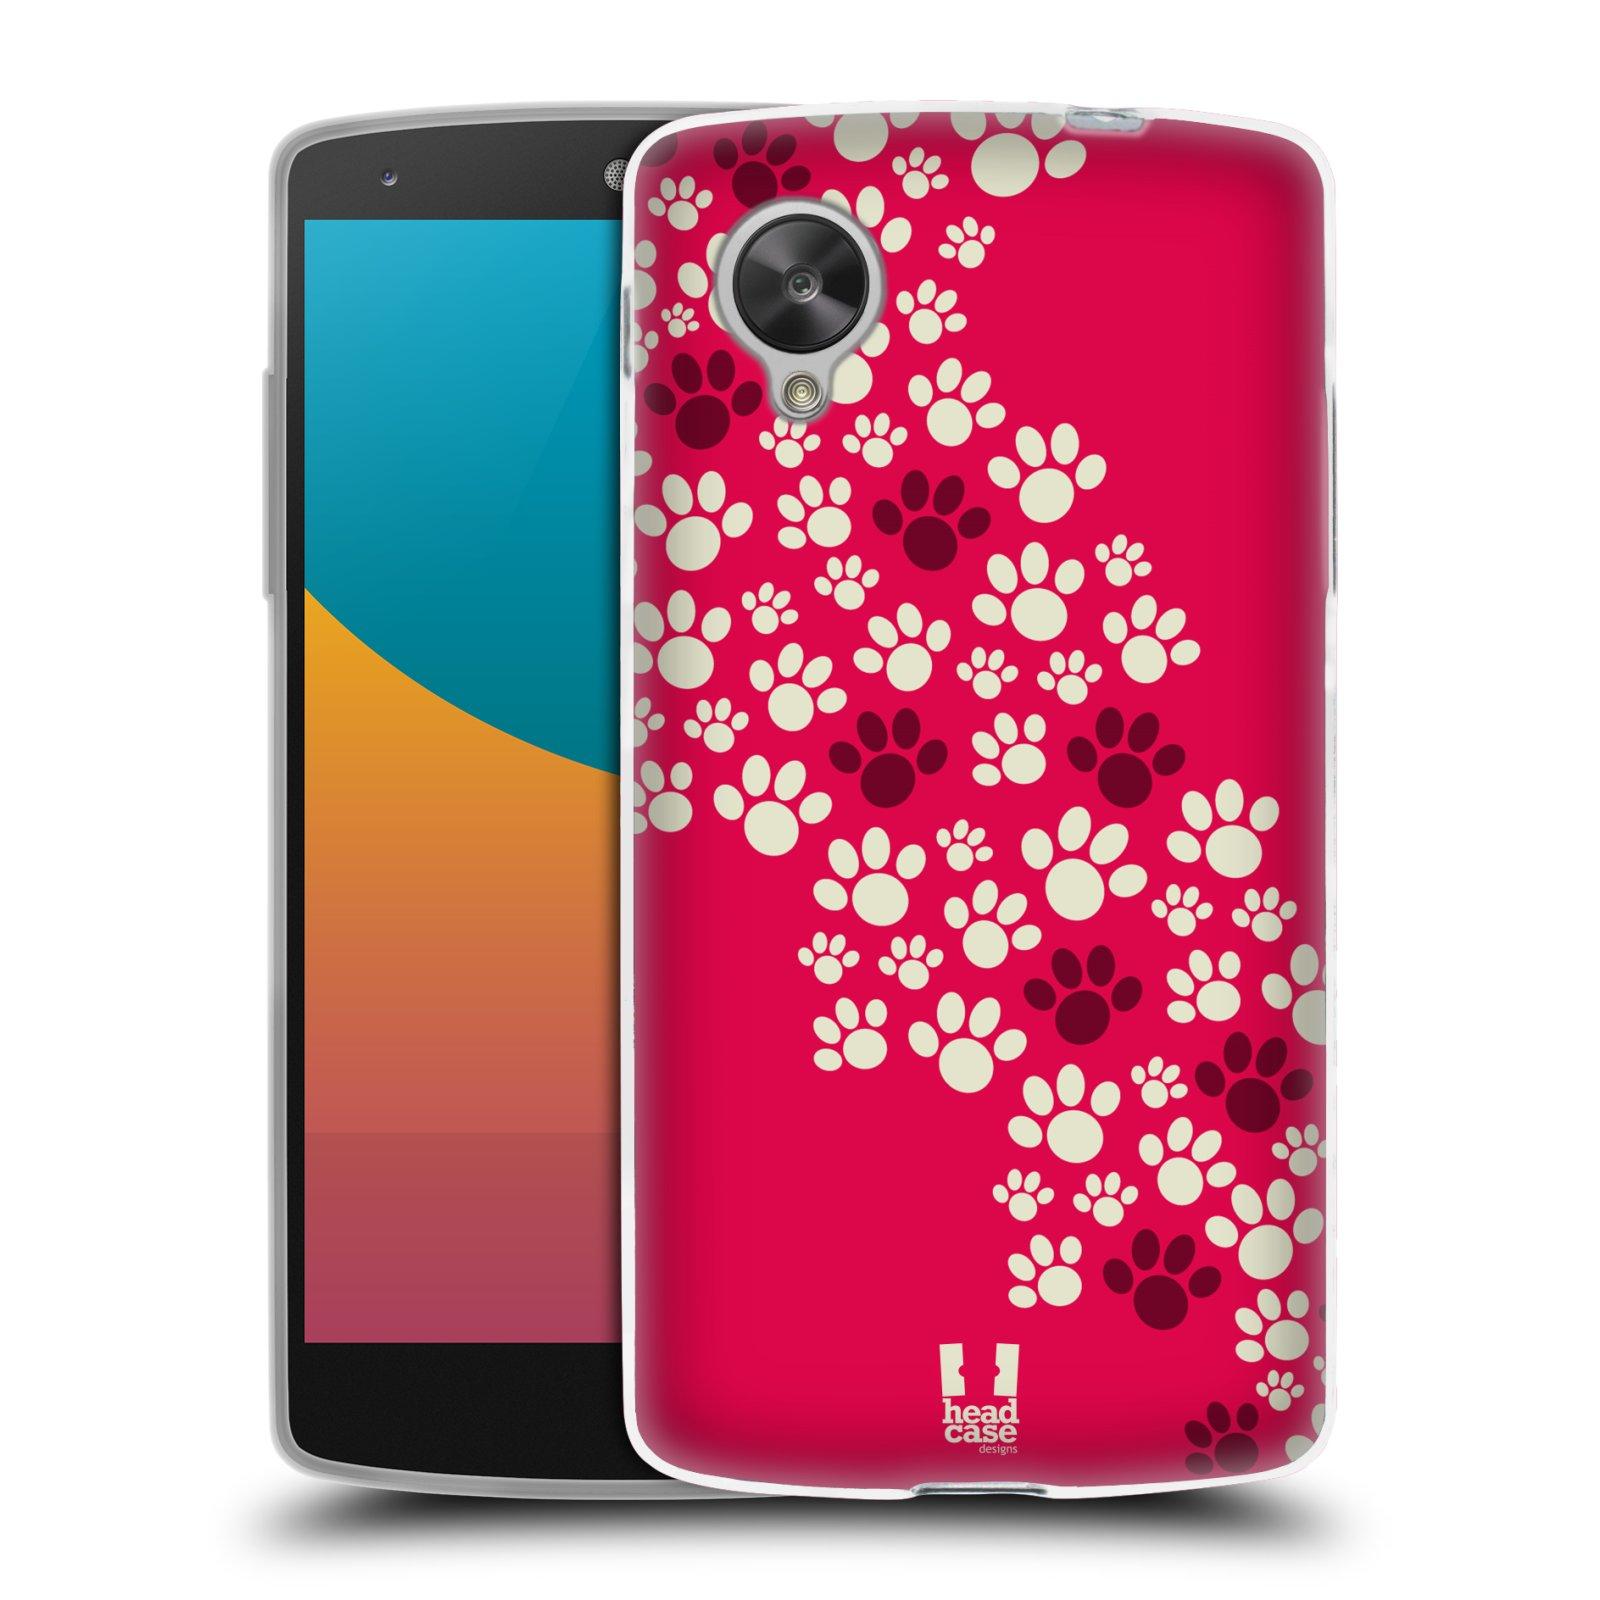 Silikonové pouzdro na mobil LG Nexus 5 HEAD CASE TLAPKY RŮŽOVÉ (Silikonový kryt či obal na mobilní telefon LG Google Nexus 5 D821)